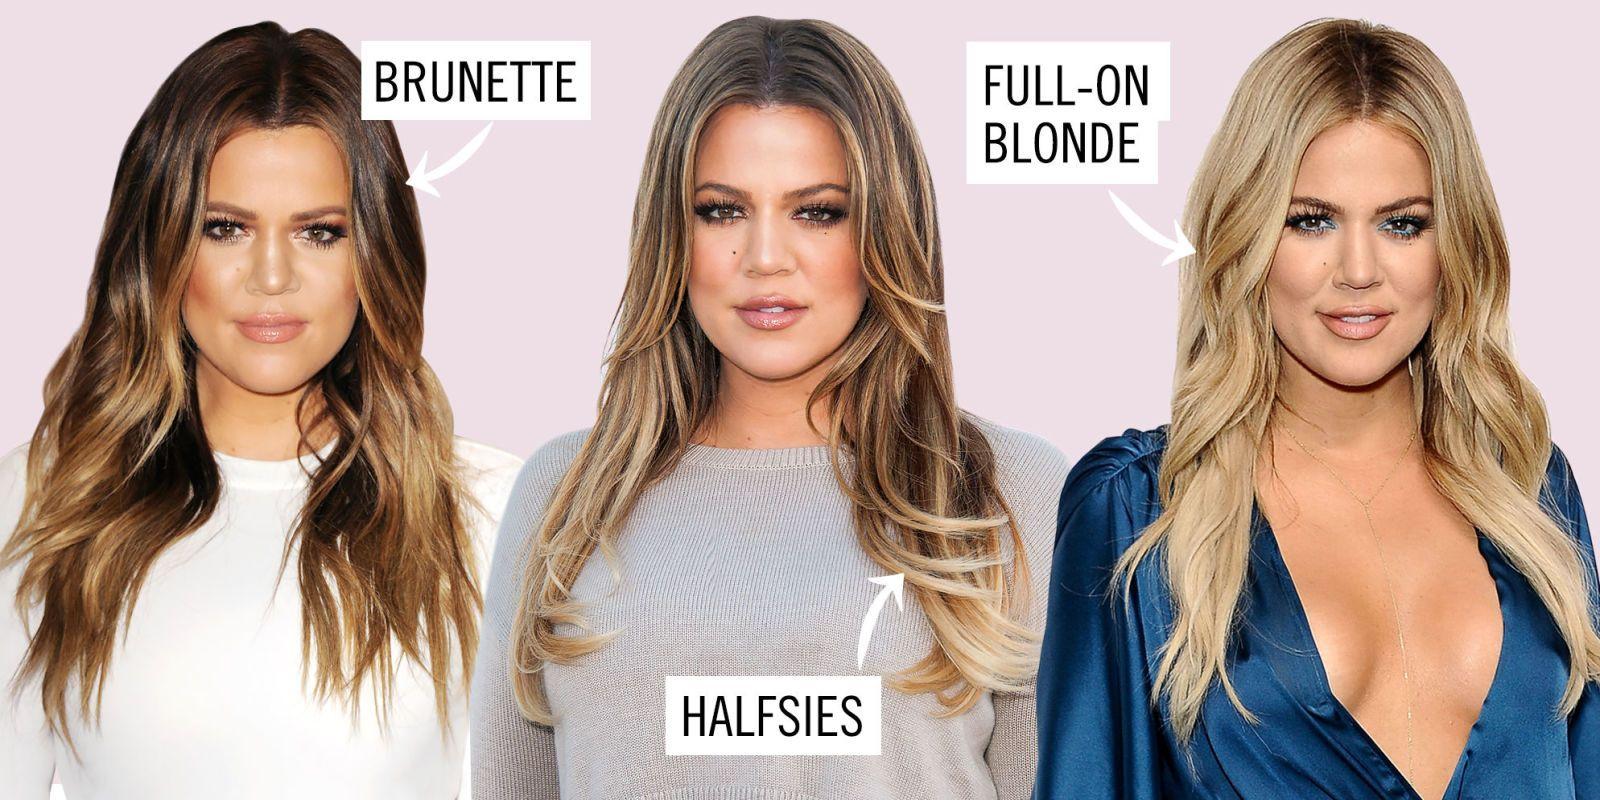 Going brunette from blonde